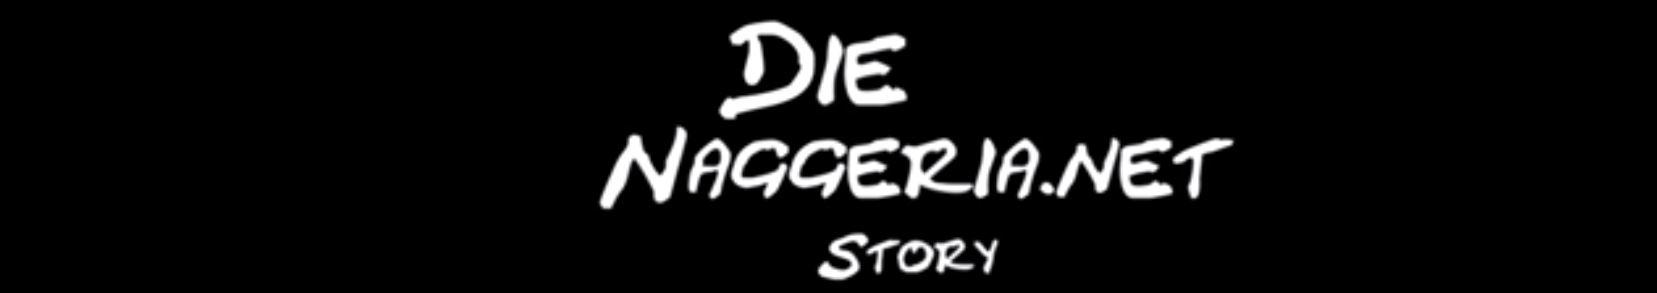 naggerstory_banner